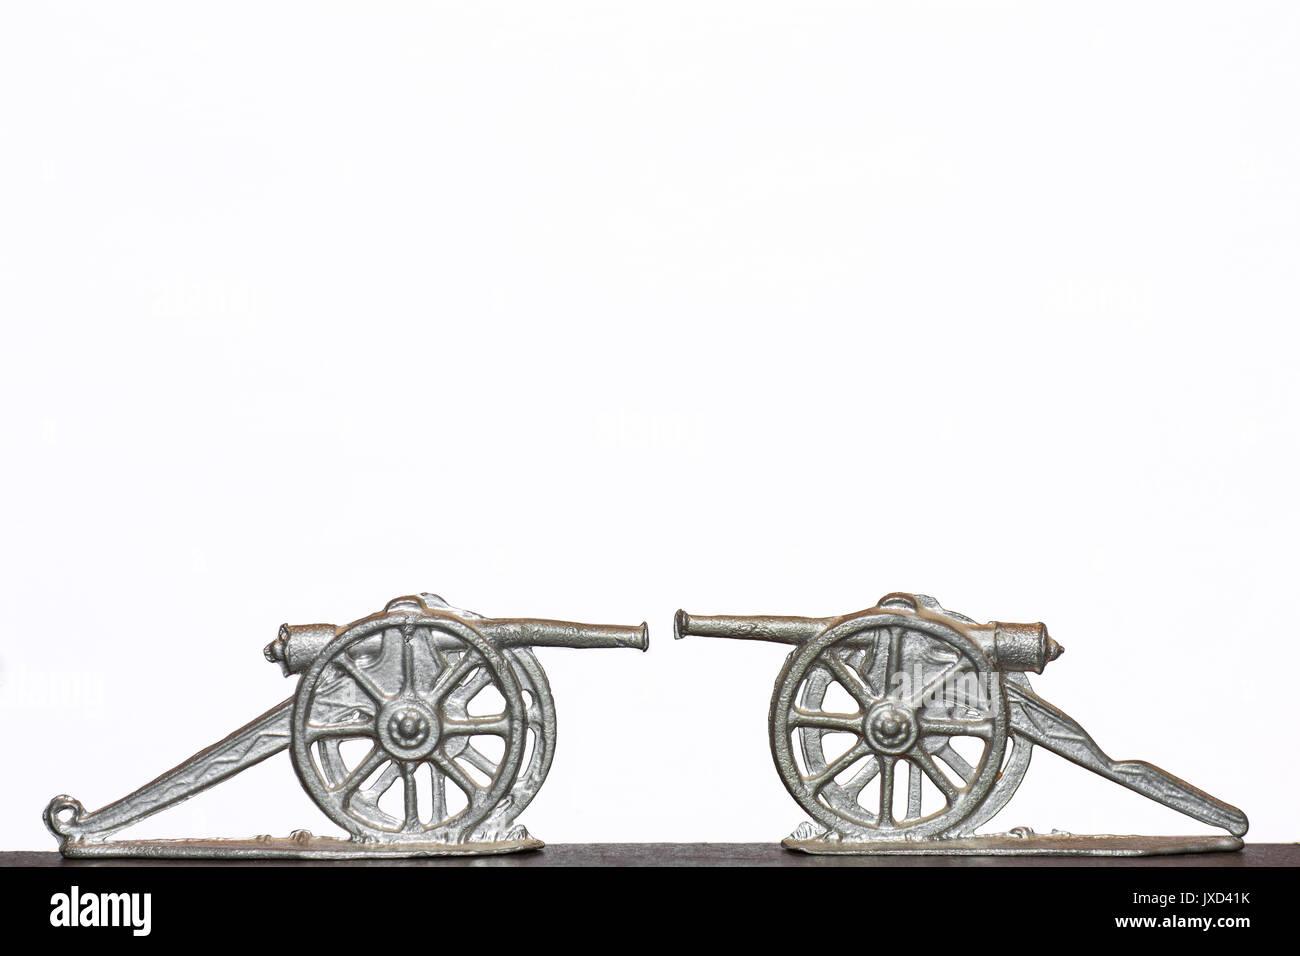 Tin miniature cannon - Stock Image